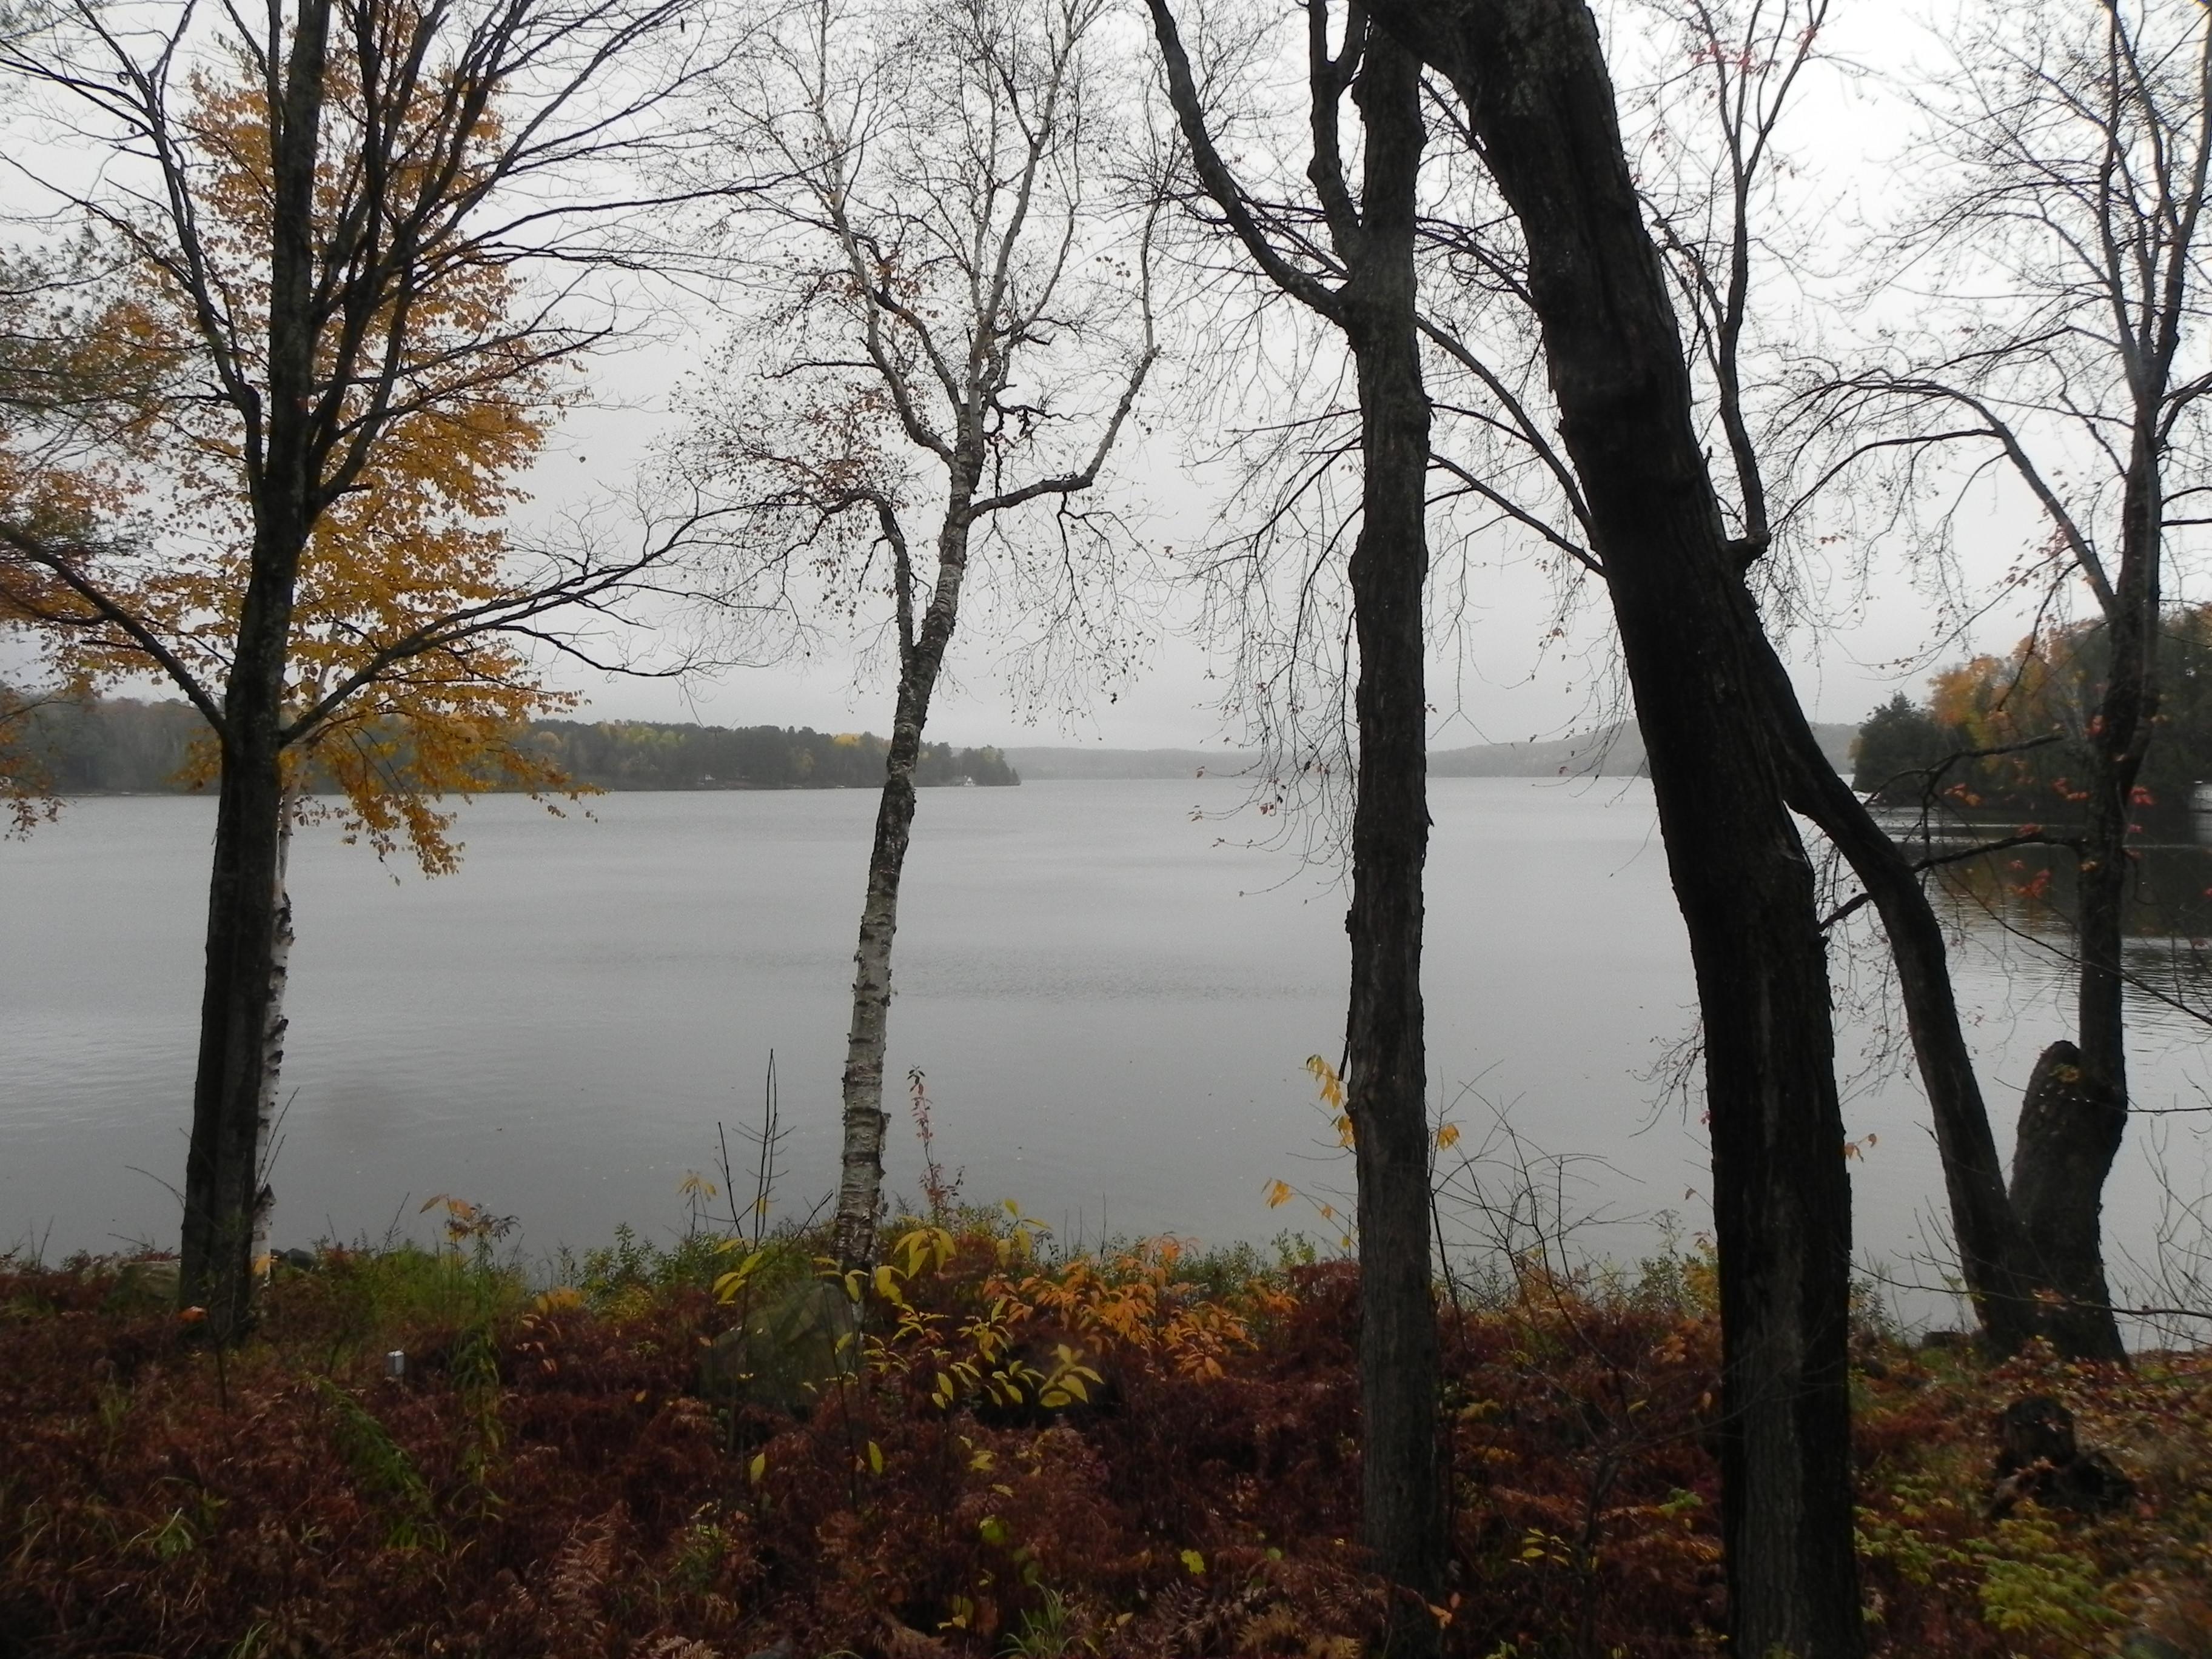 Lake of Bays Addtion - Lake View